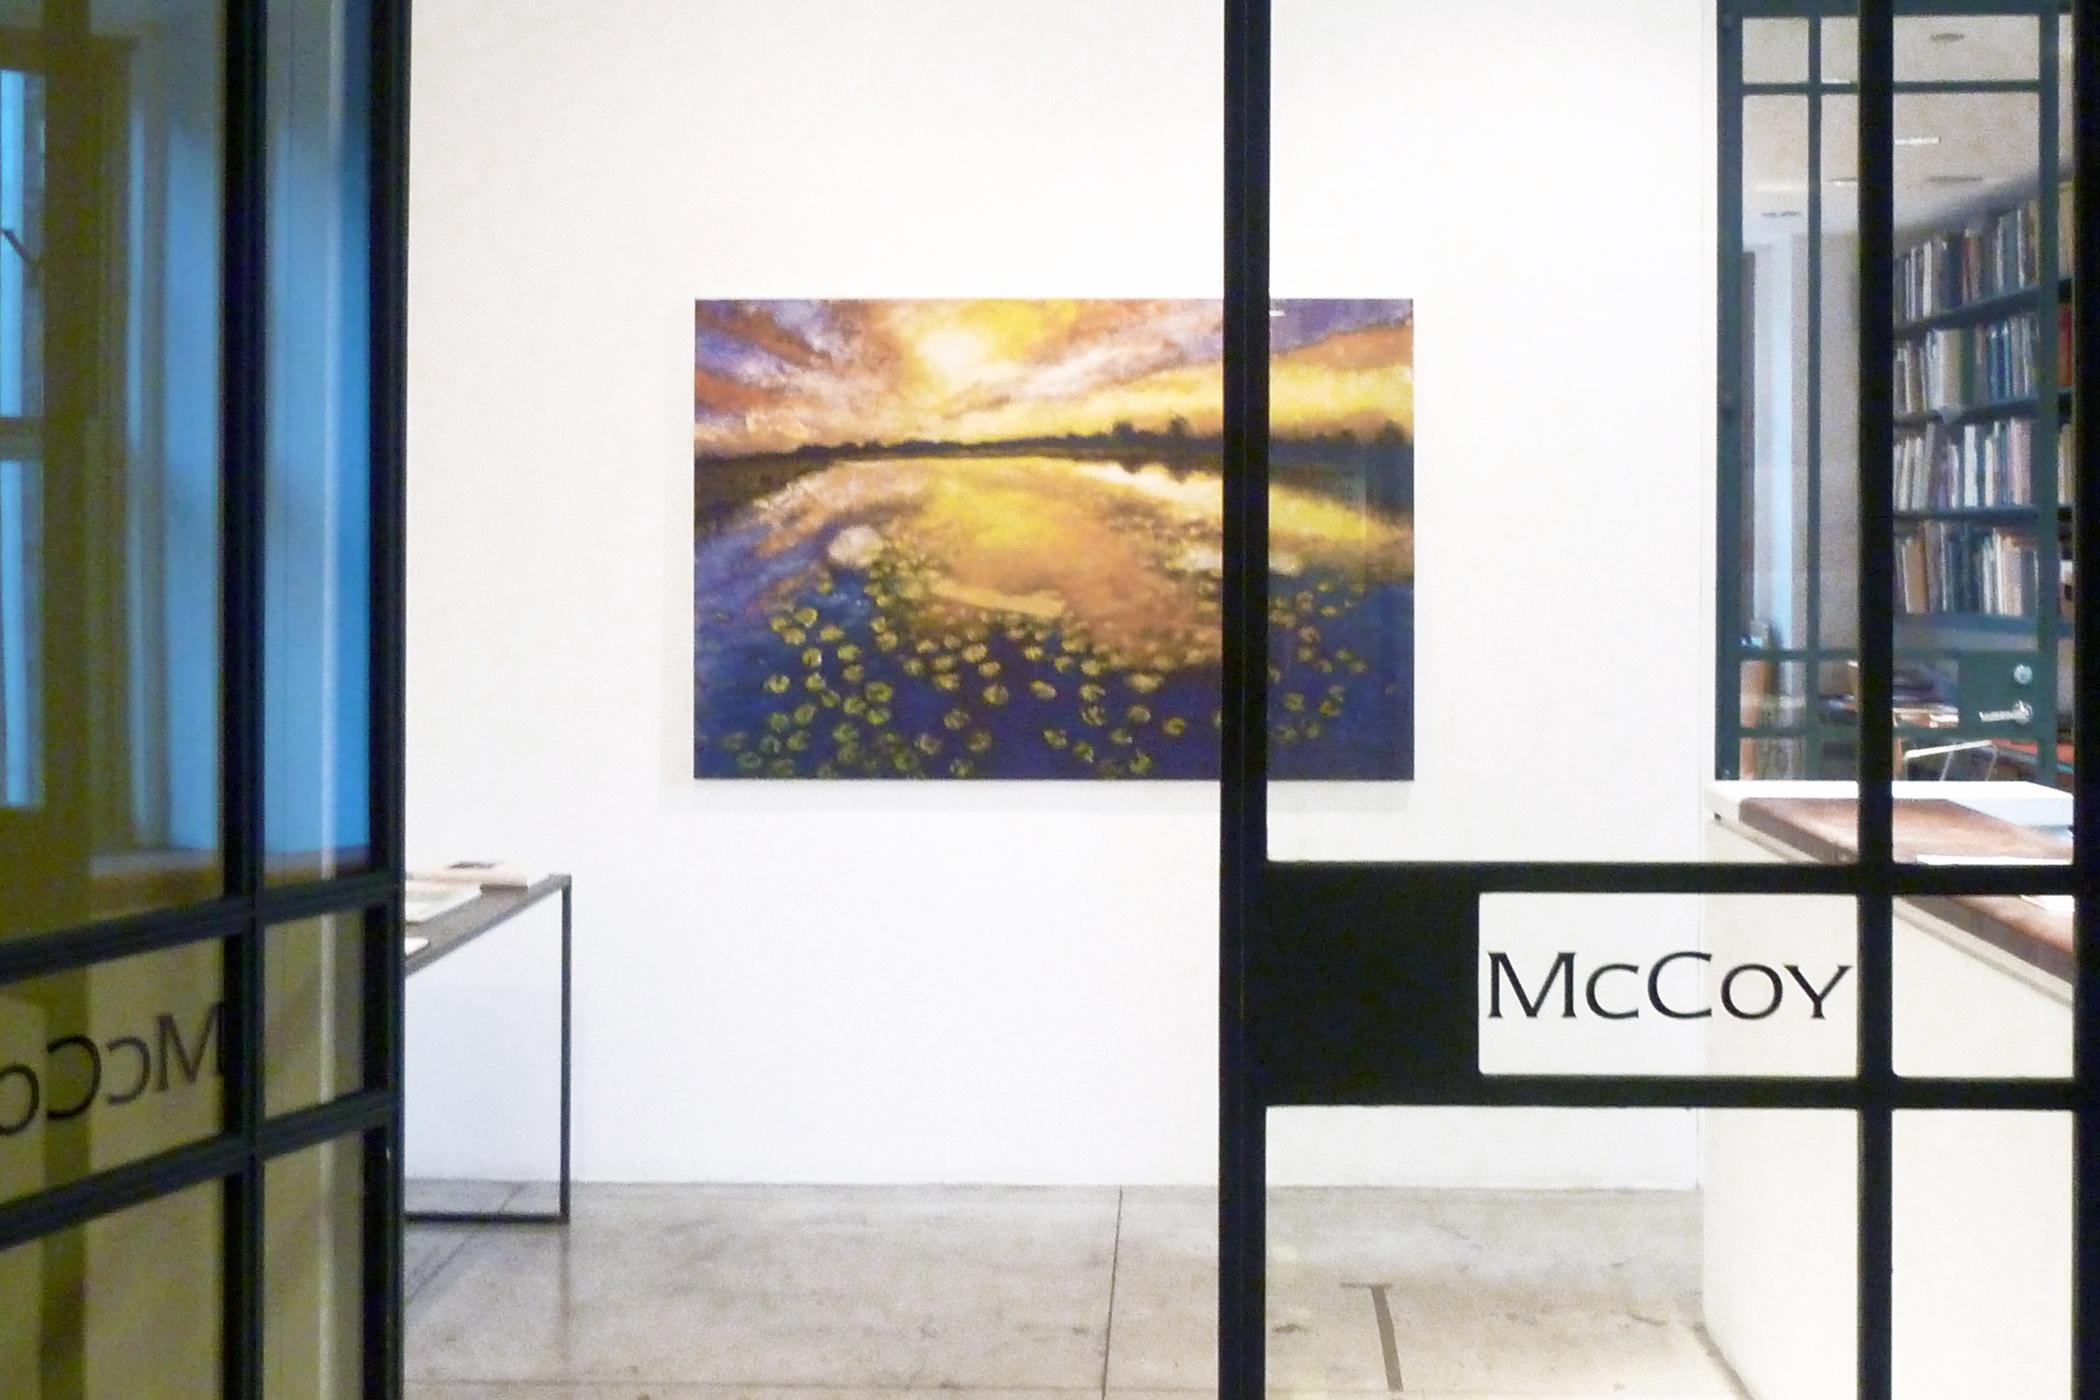 ANNELIES STRBA , Installation views, Jason McCoy Gallery, New York, 2010.